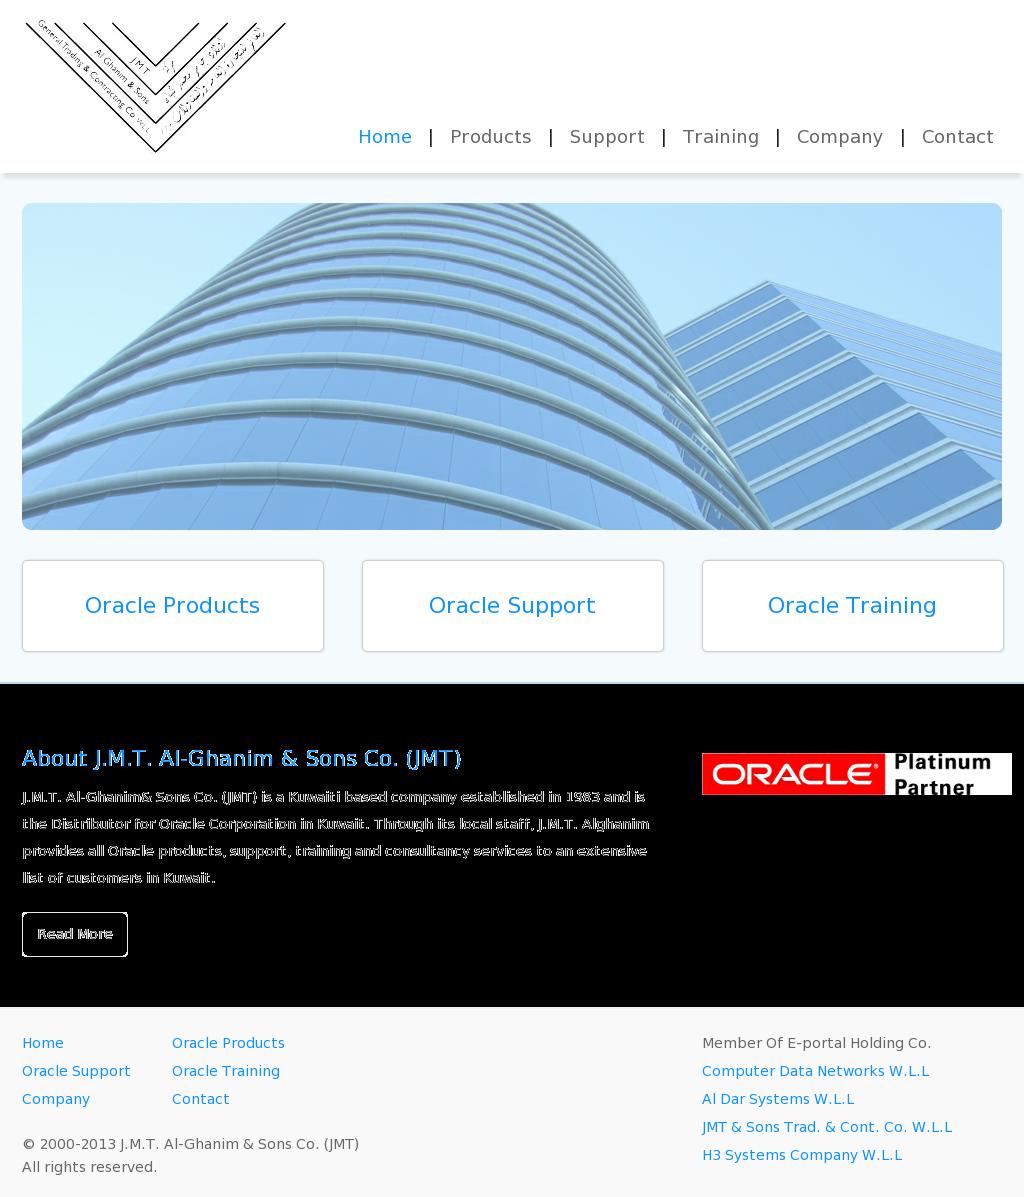 Jmtco Competitors, Revenue and Employees - Owler Company Profile